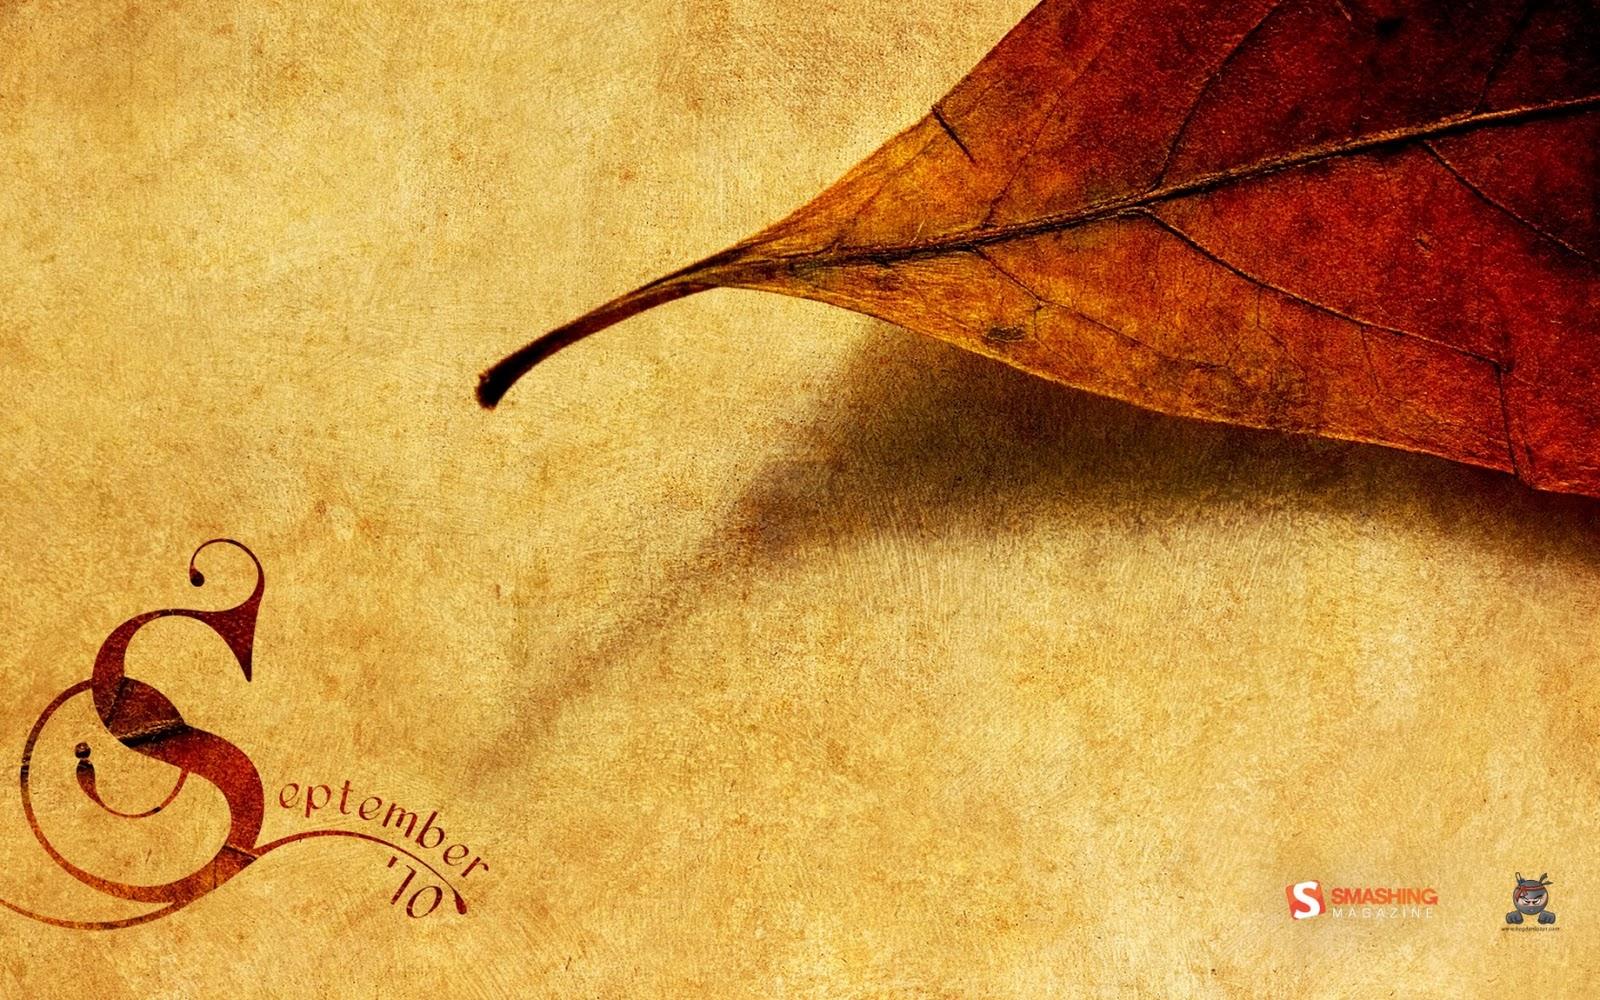 The best top autumn desktop wallpapers 11 En Güzel Sonbahar HD Duvar Kağıtları